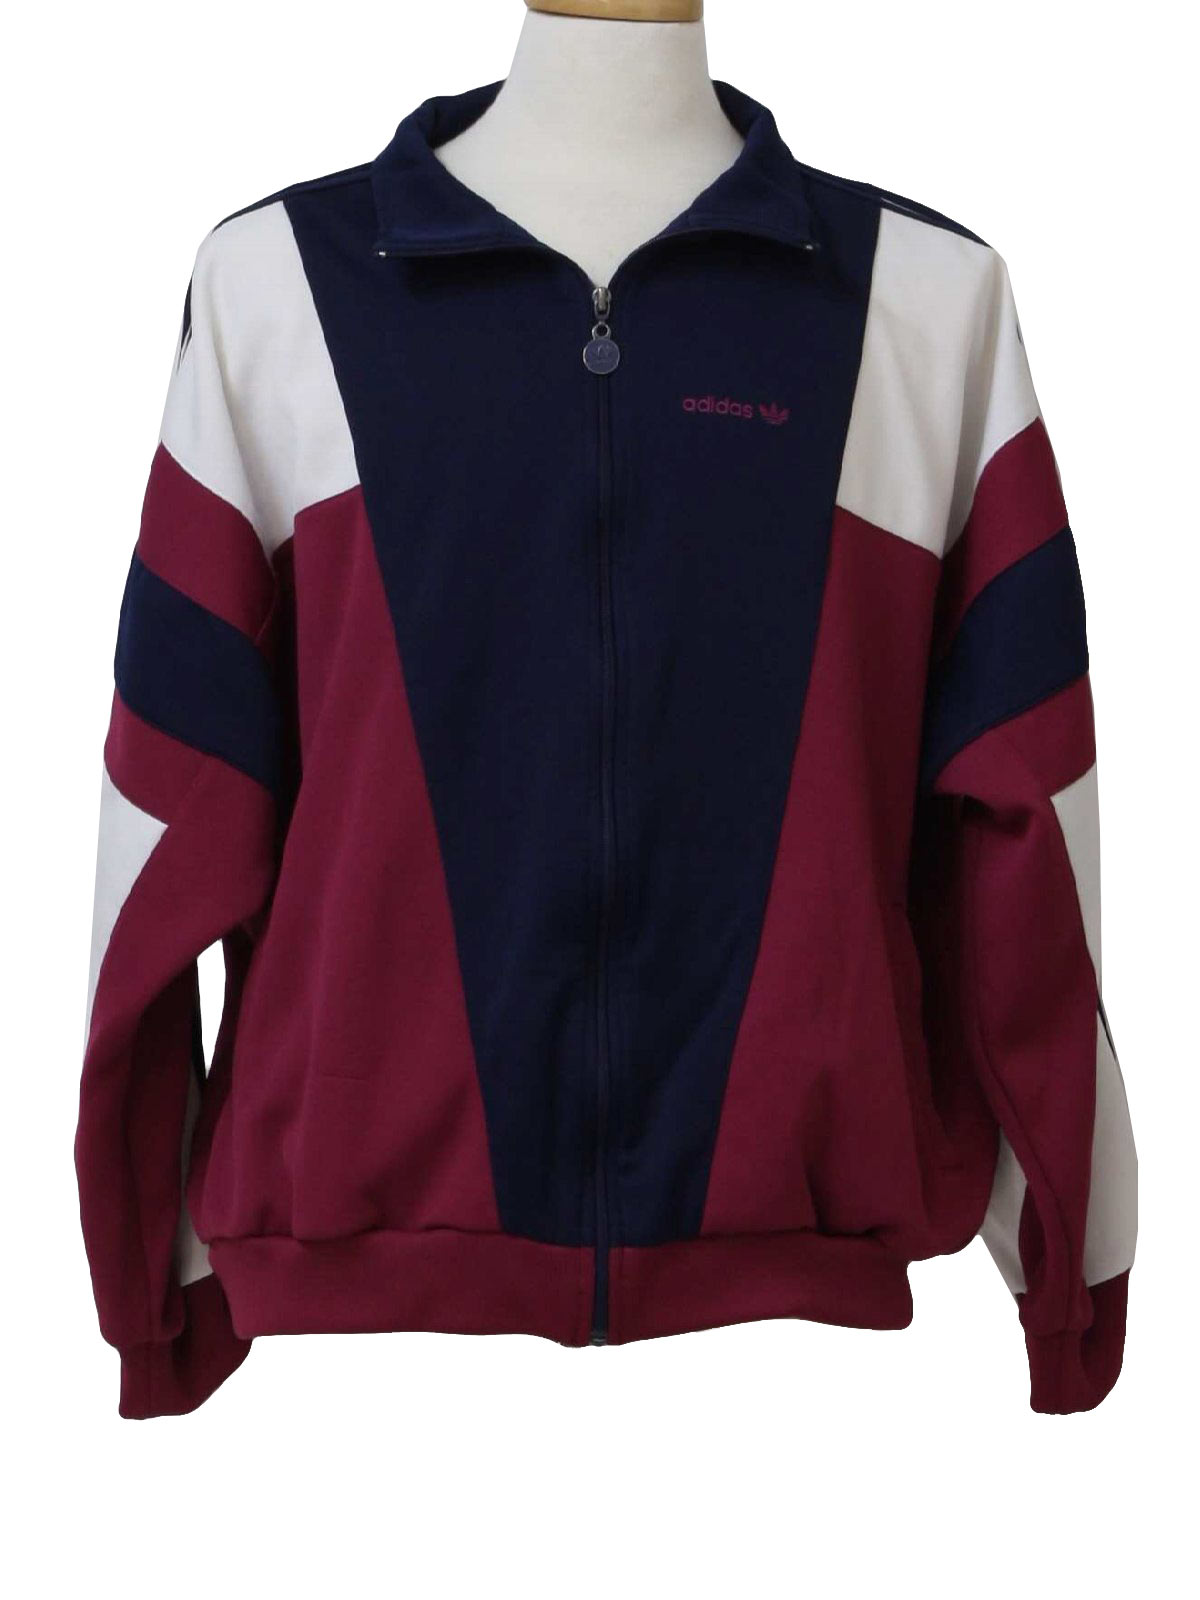 1990s Vintage Jacket 90s Adidas Mens Rosy Wine